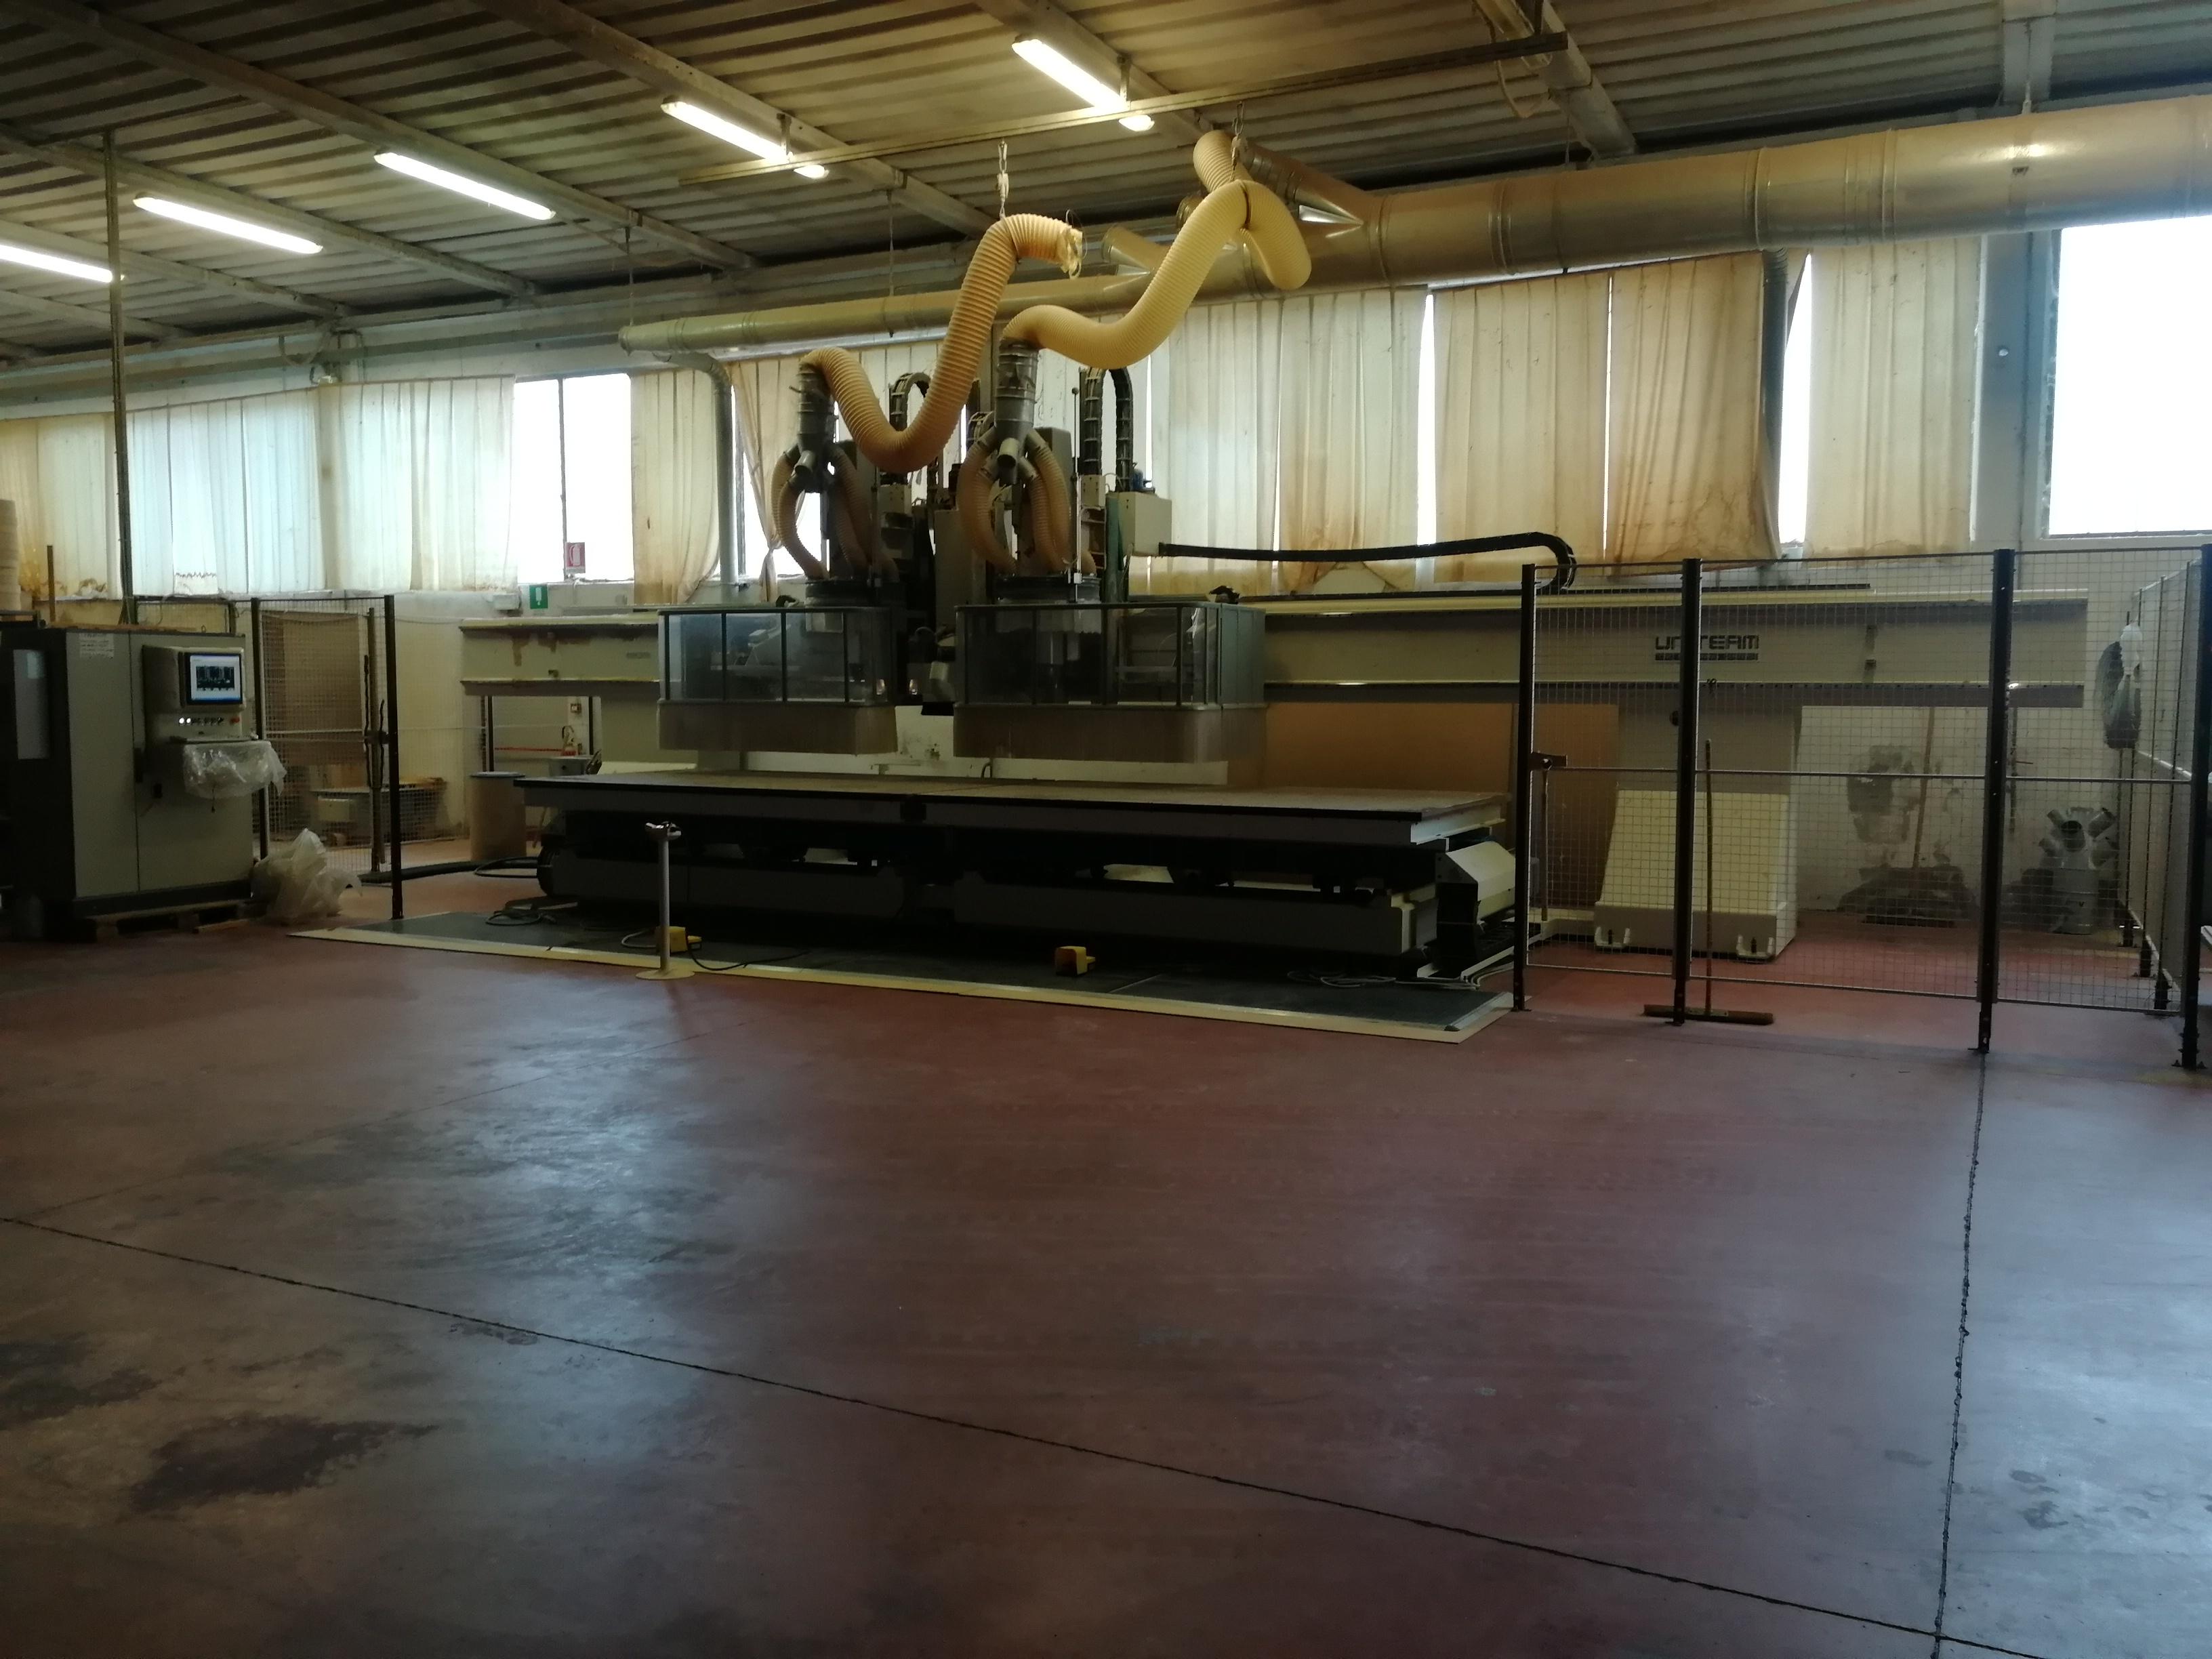 CNC DOPPIA TESTA 5 ASSI - UNITEAM MAJOR 2R/6016-430 in vendita - foto 1